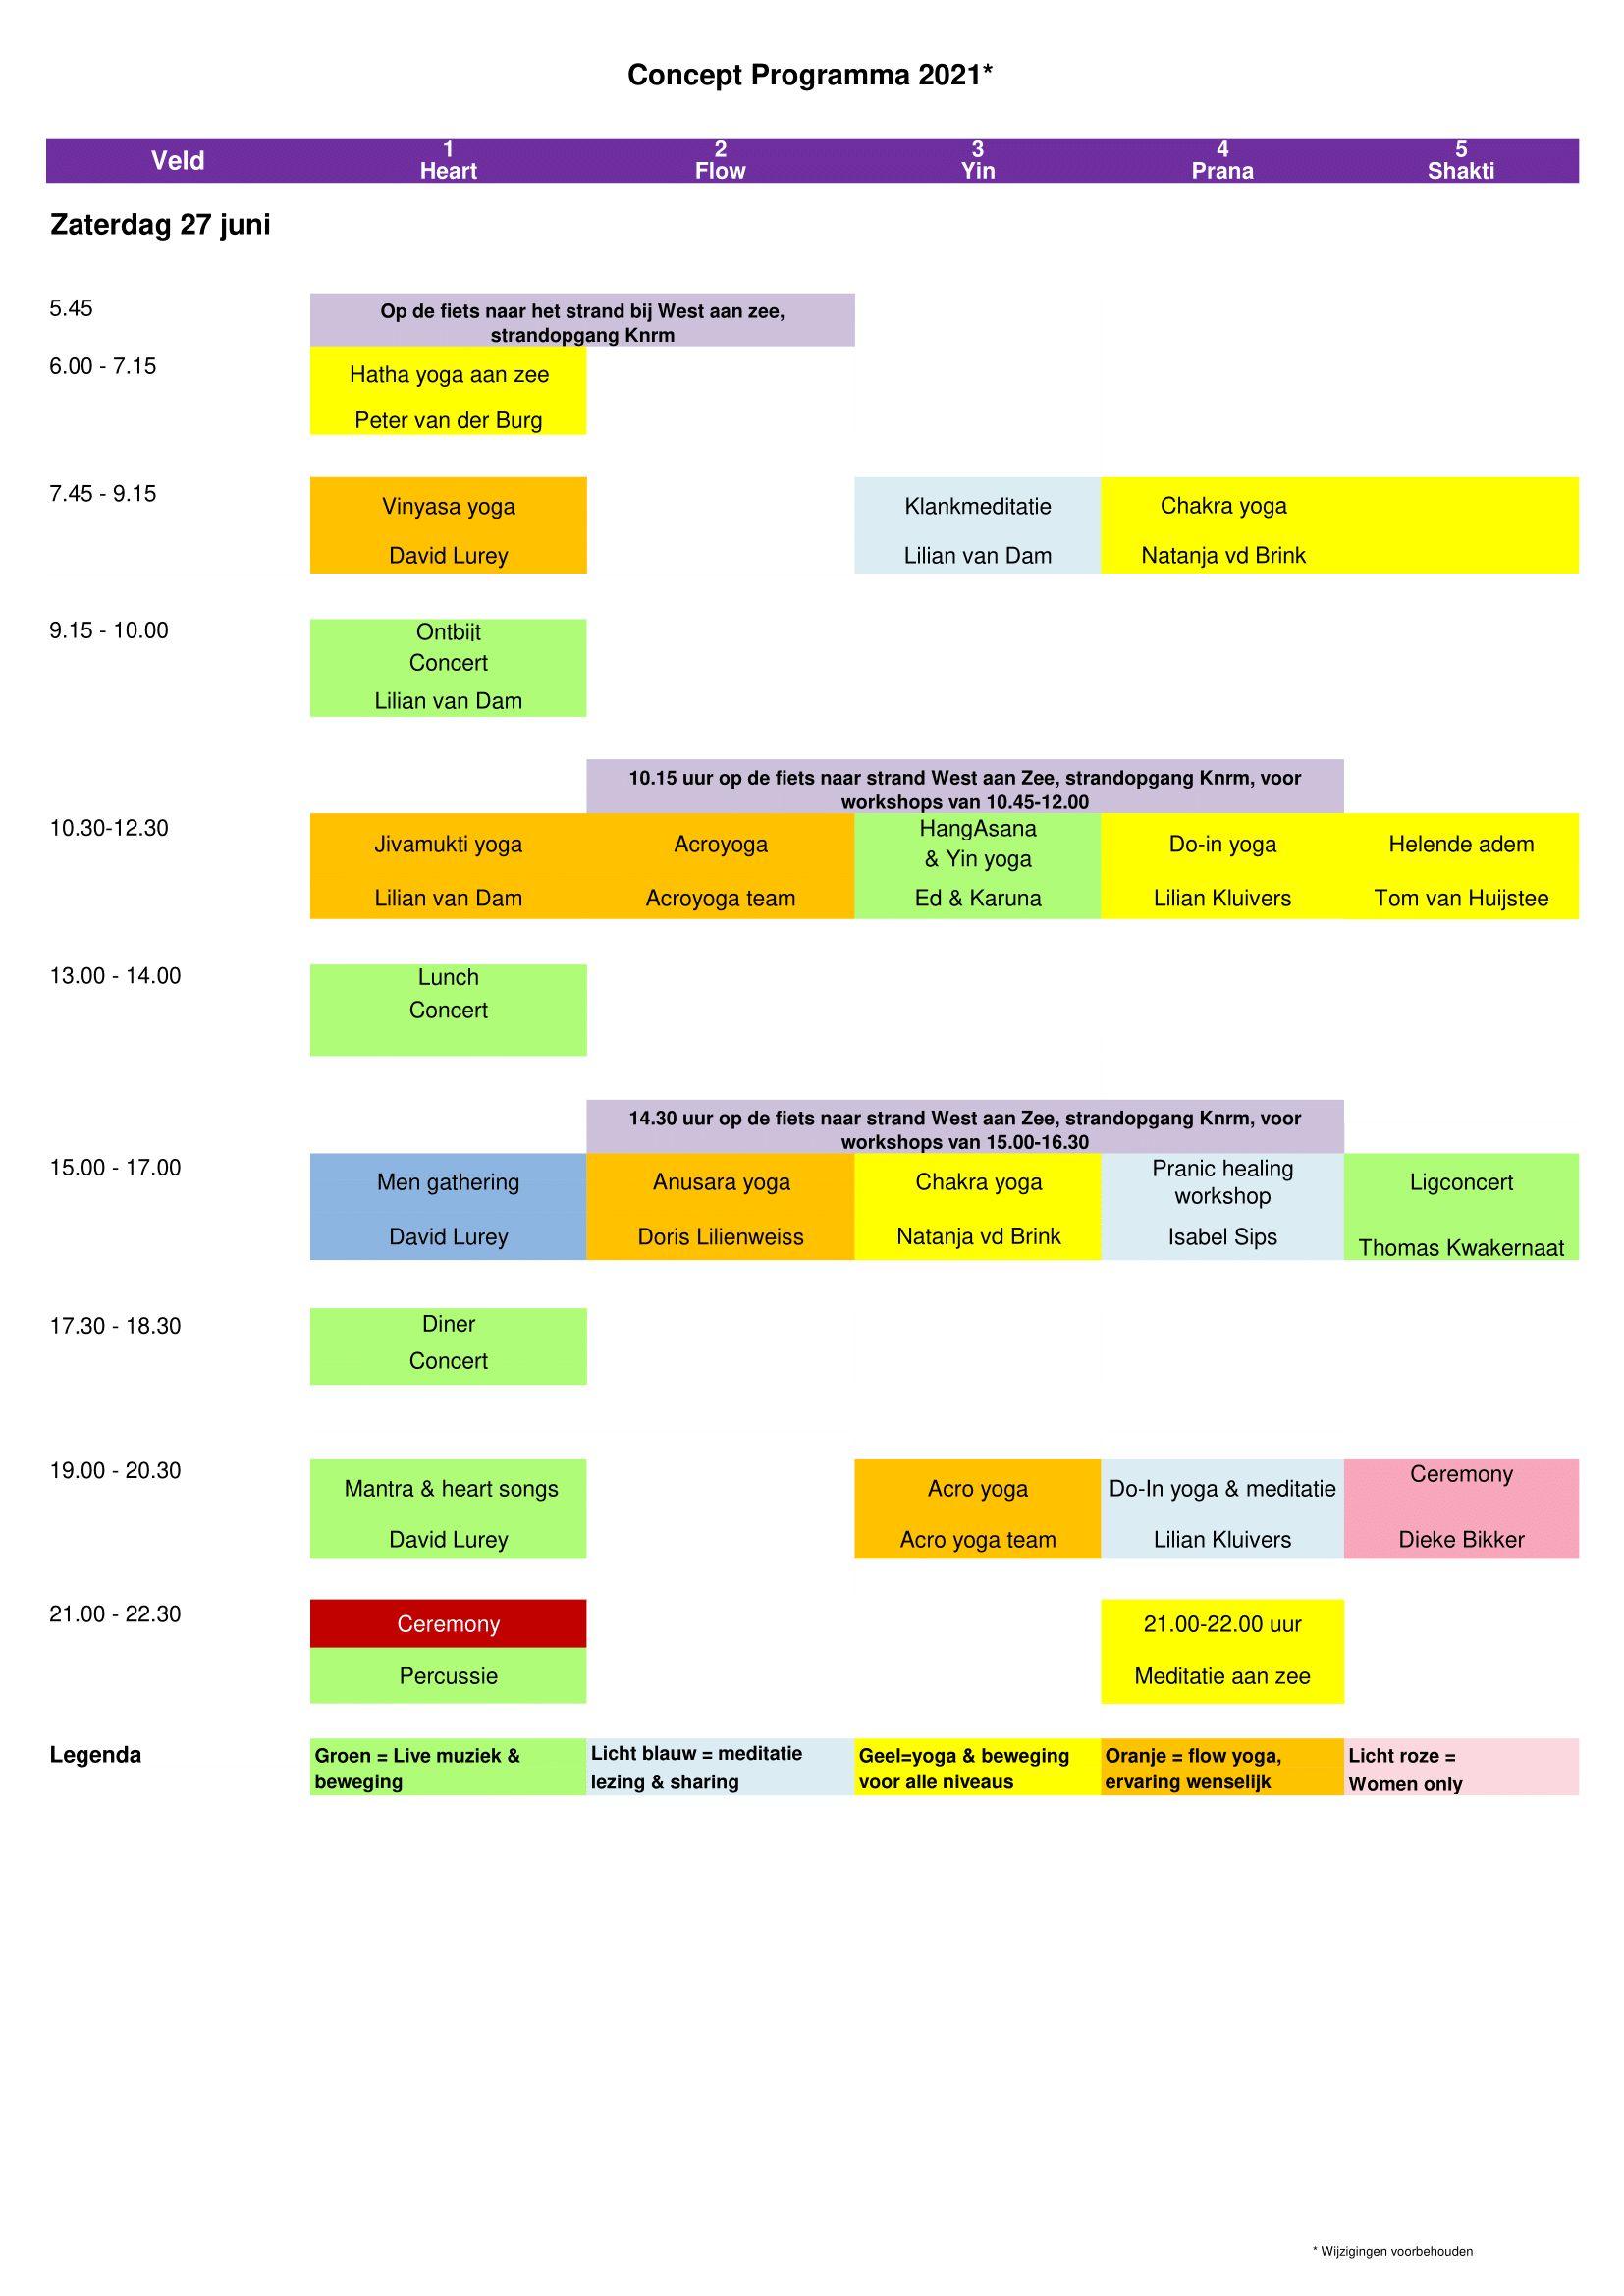 Programmaschema hoofdprogramma op zaterdag